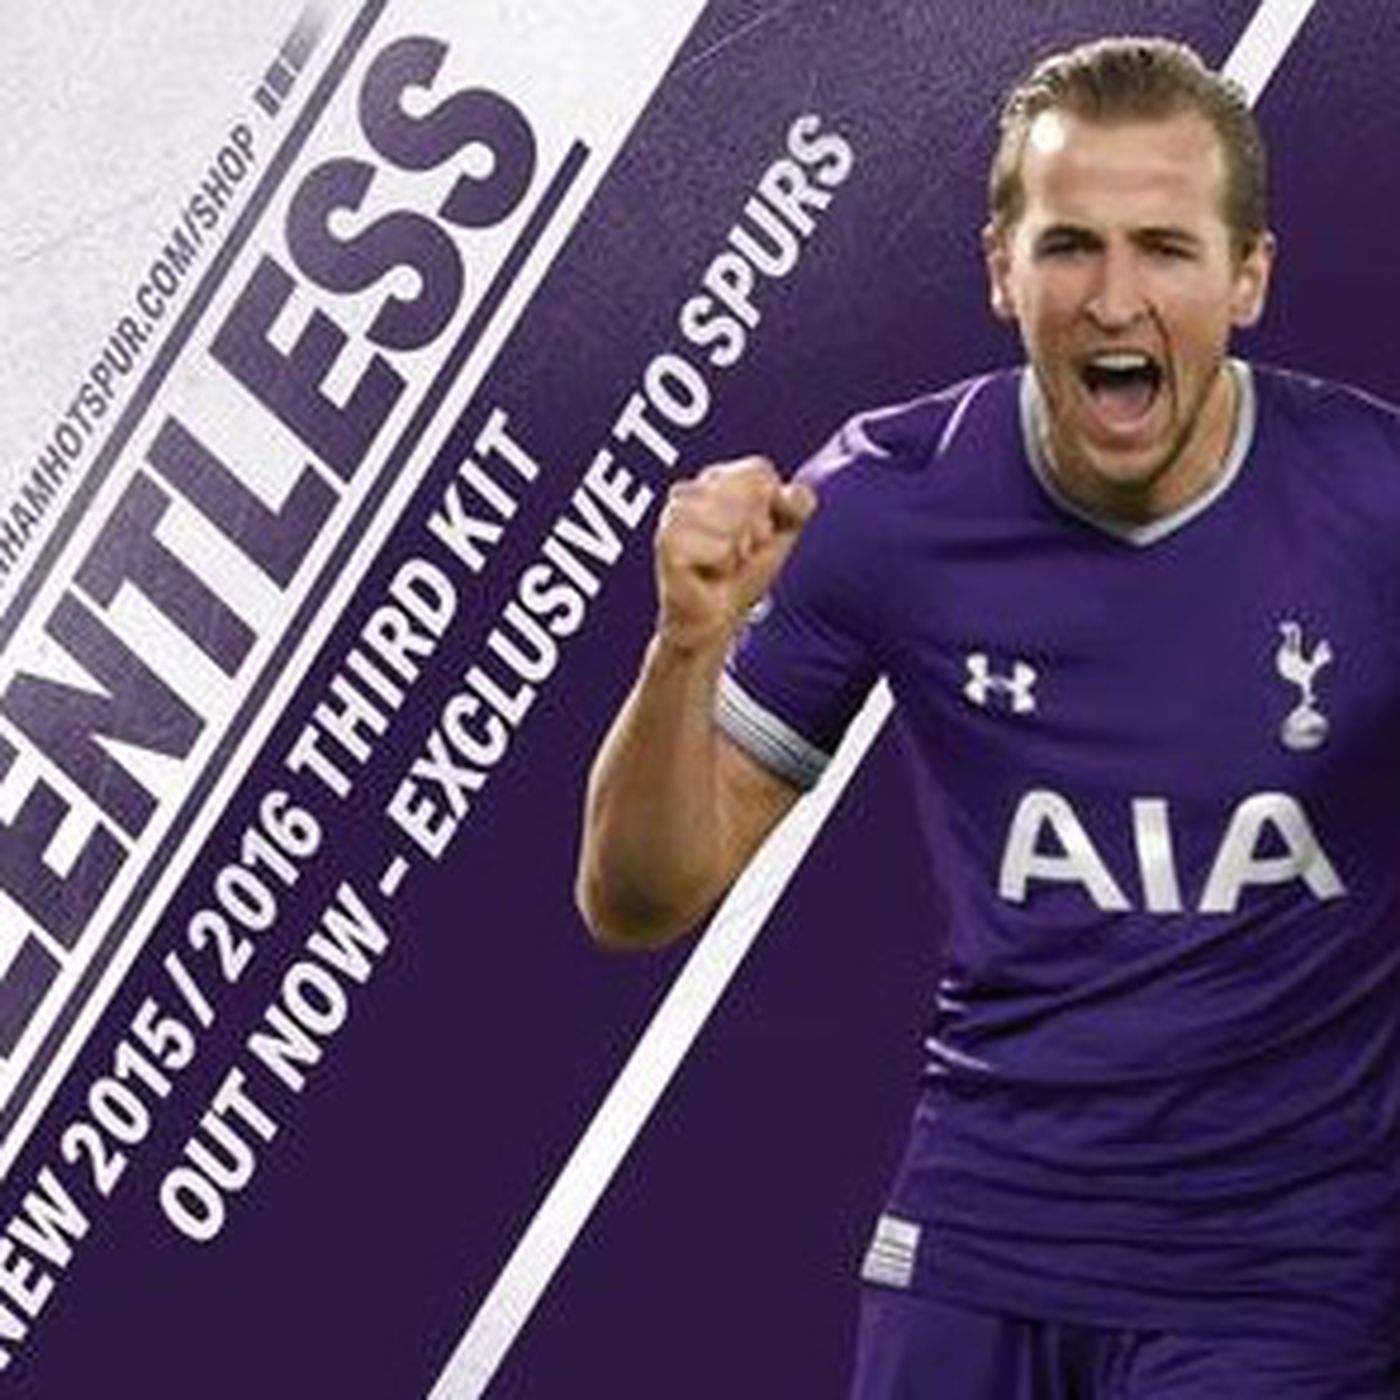 Tottenham reveals 2015-16 third kit  IT S PURPLE - Cartilage Free ... 7a5c0e3bf